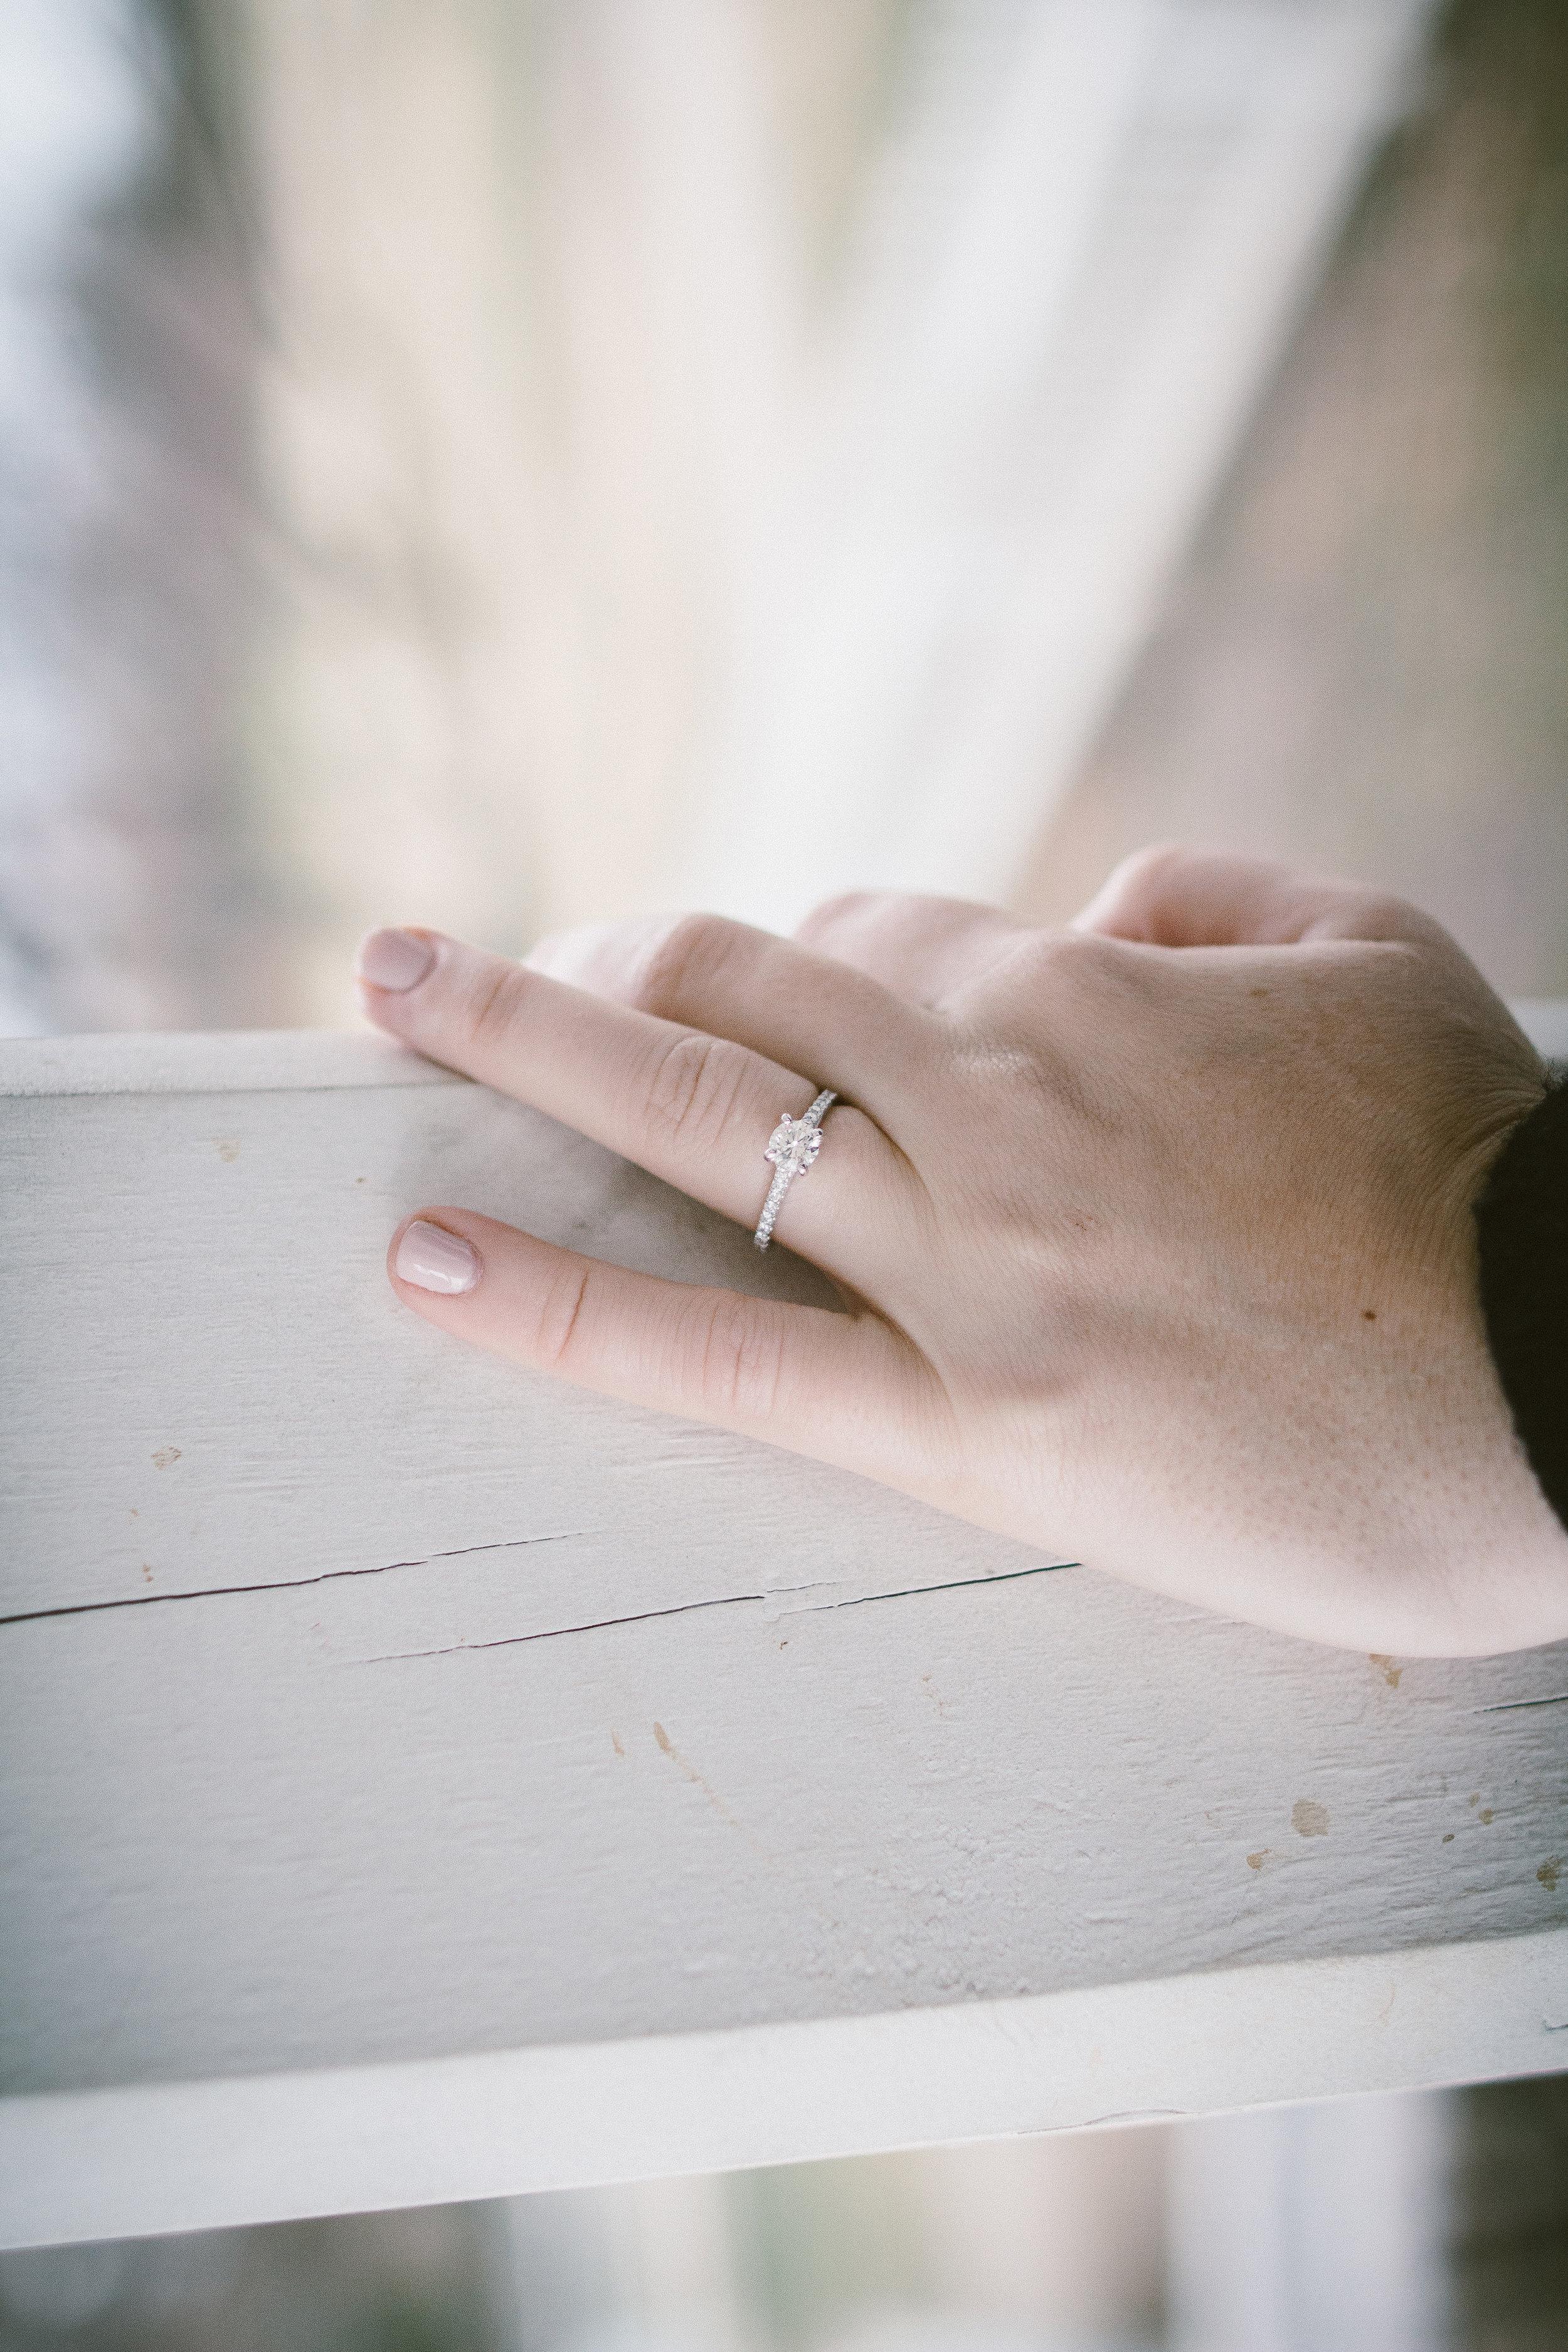 MP_16.12.18_Nick & Kendall Engagement Shoot-0097.jpg